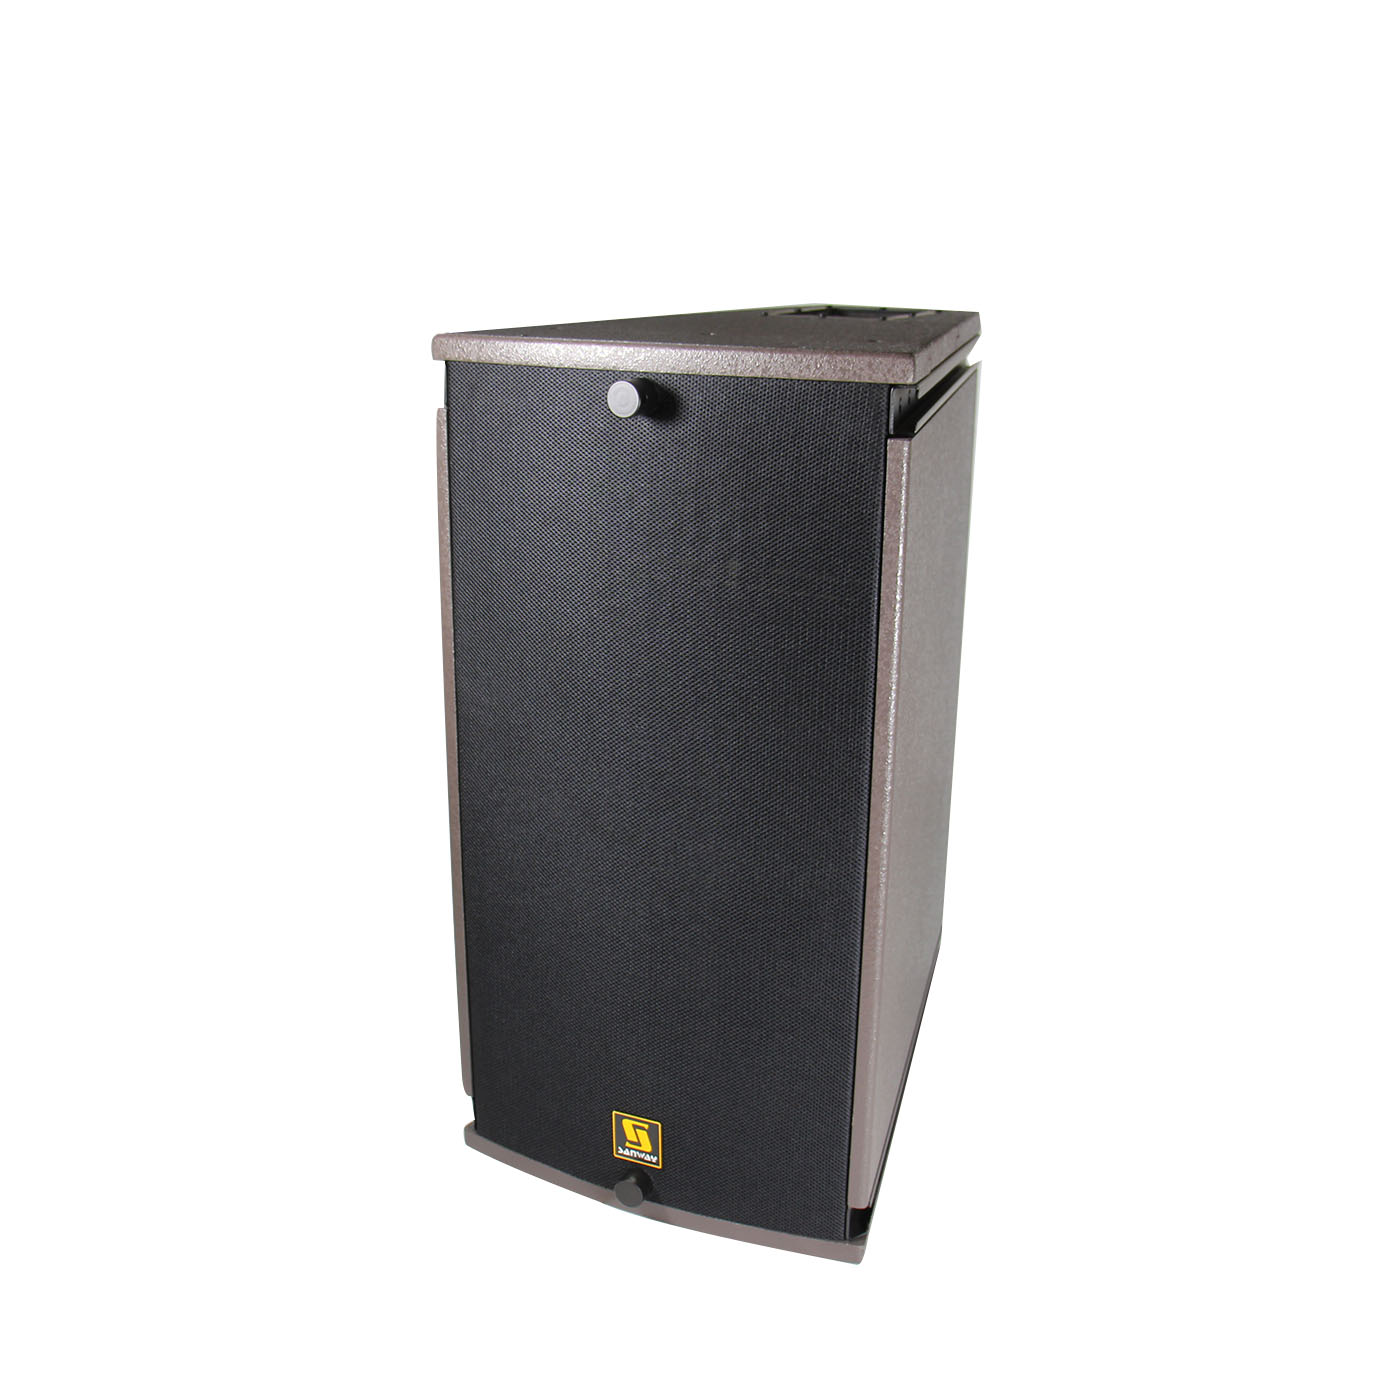 Arcs ii 15 inch 2 way line array speaker with constant curvature arcs ii 15 inch 2 way line array speaker with constant curvature design sciox Images